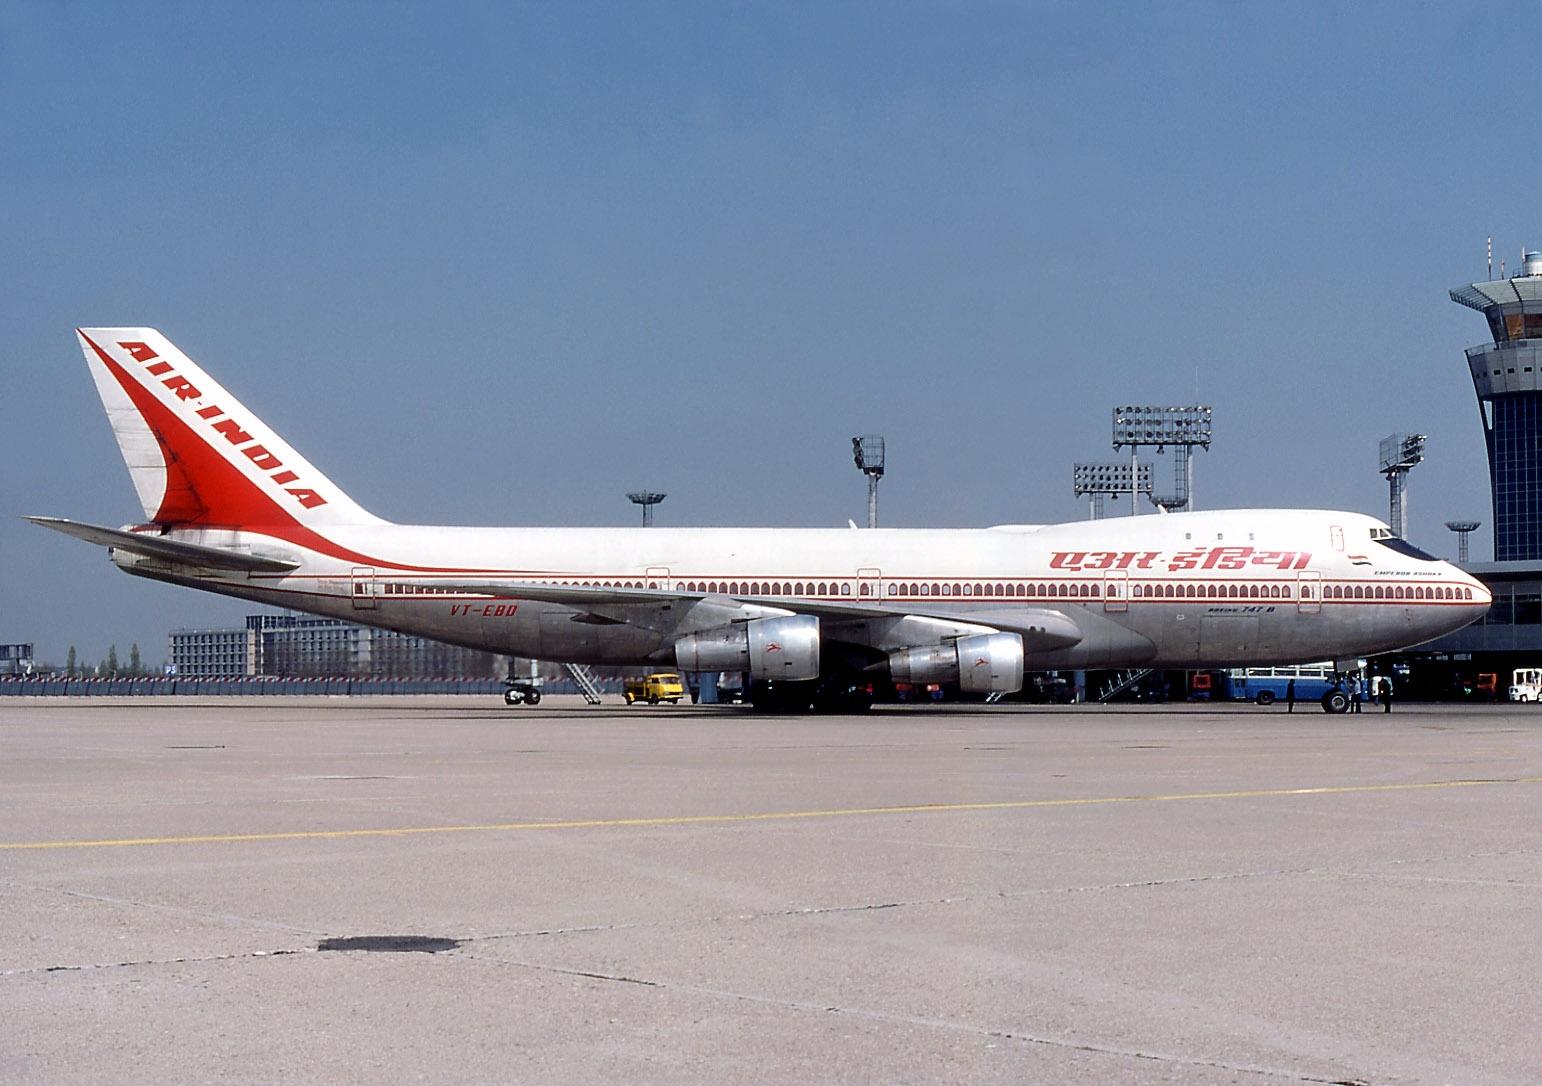 Air India Flight 855 - Wikipedia